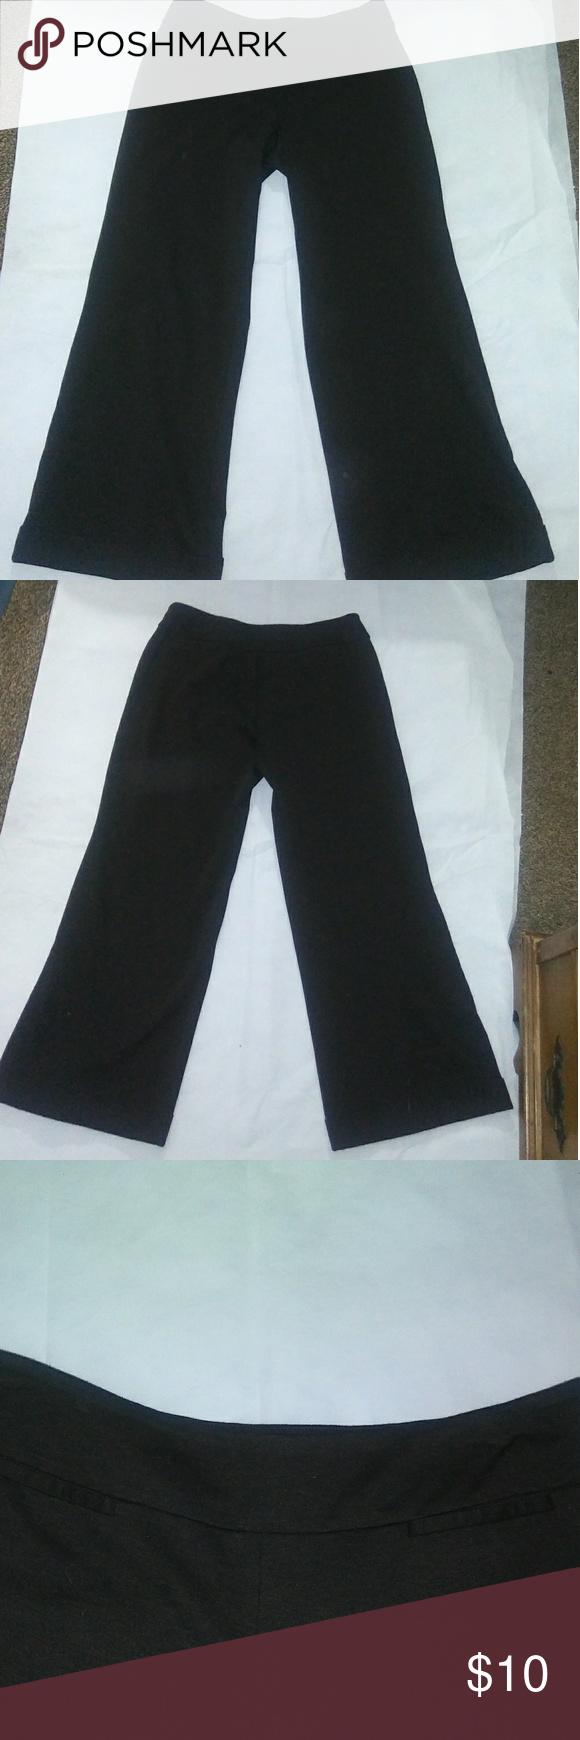 New york u company dark brown dress pants dress pants dark brown